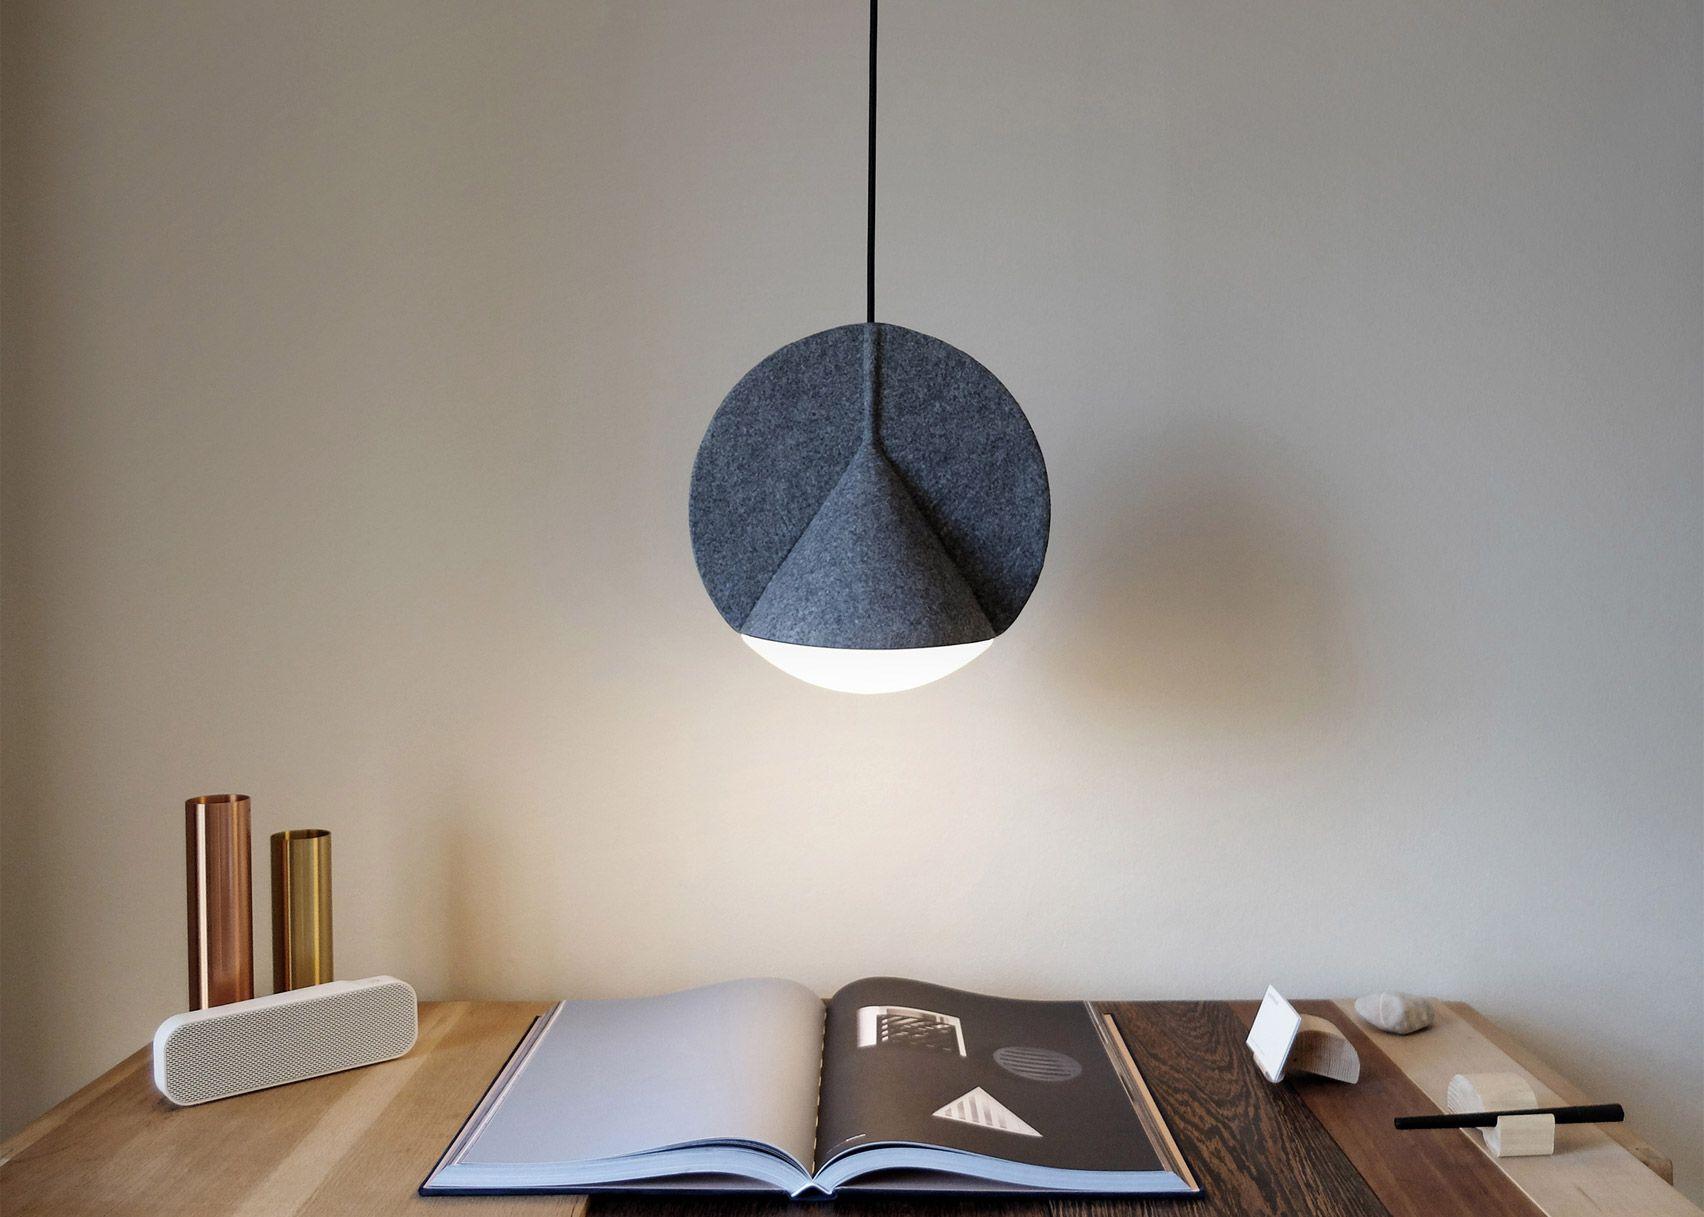 Outofstock designs geometric felt Stamp lamp for Bolia